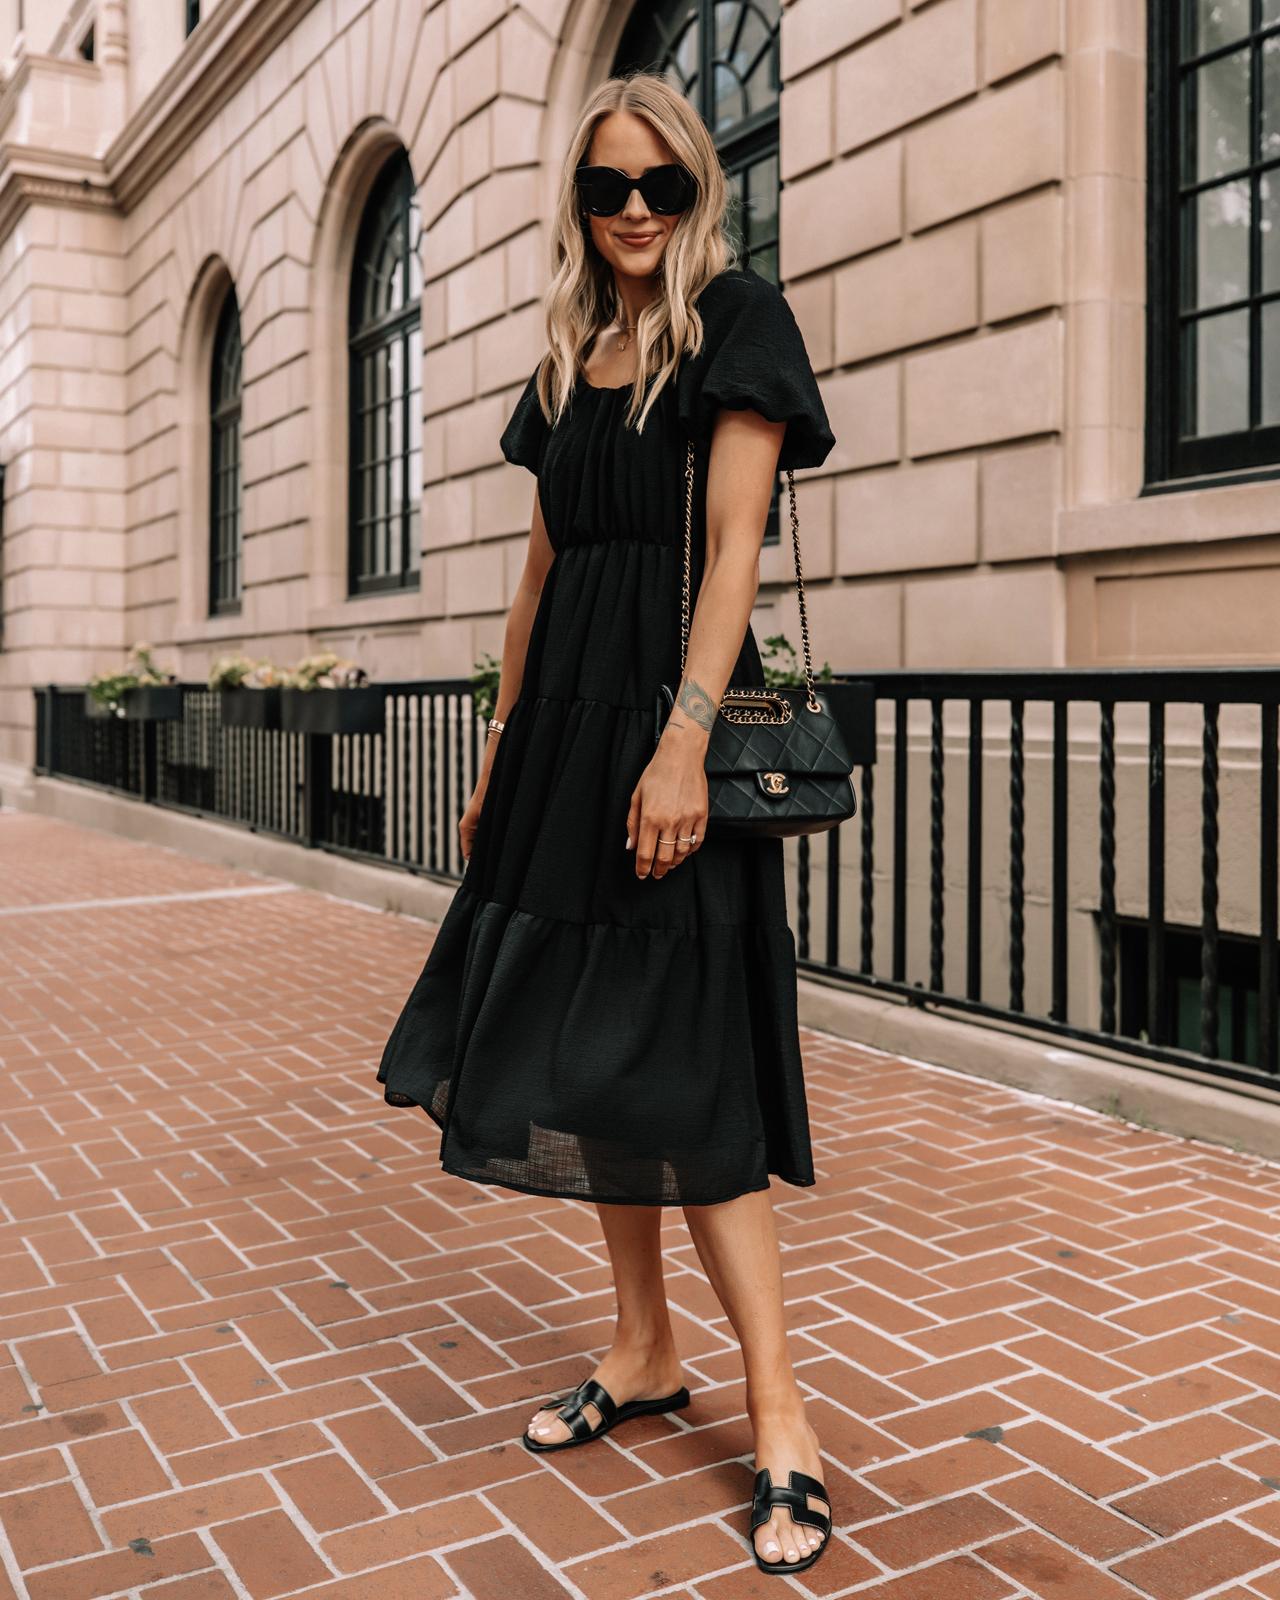 Fashion Jackson Wearing Nordstrom Black Midi Dress Black Hermes Sandals Summer Outfit